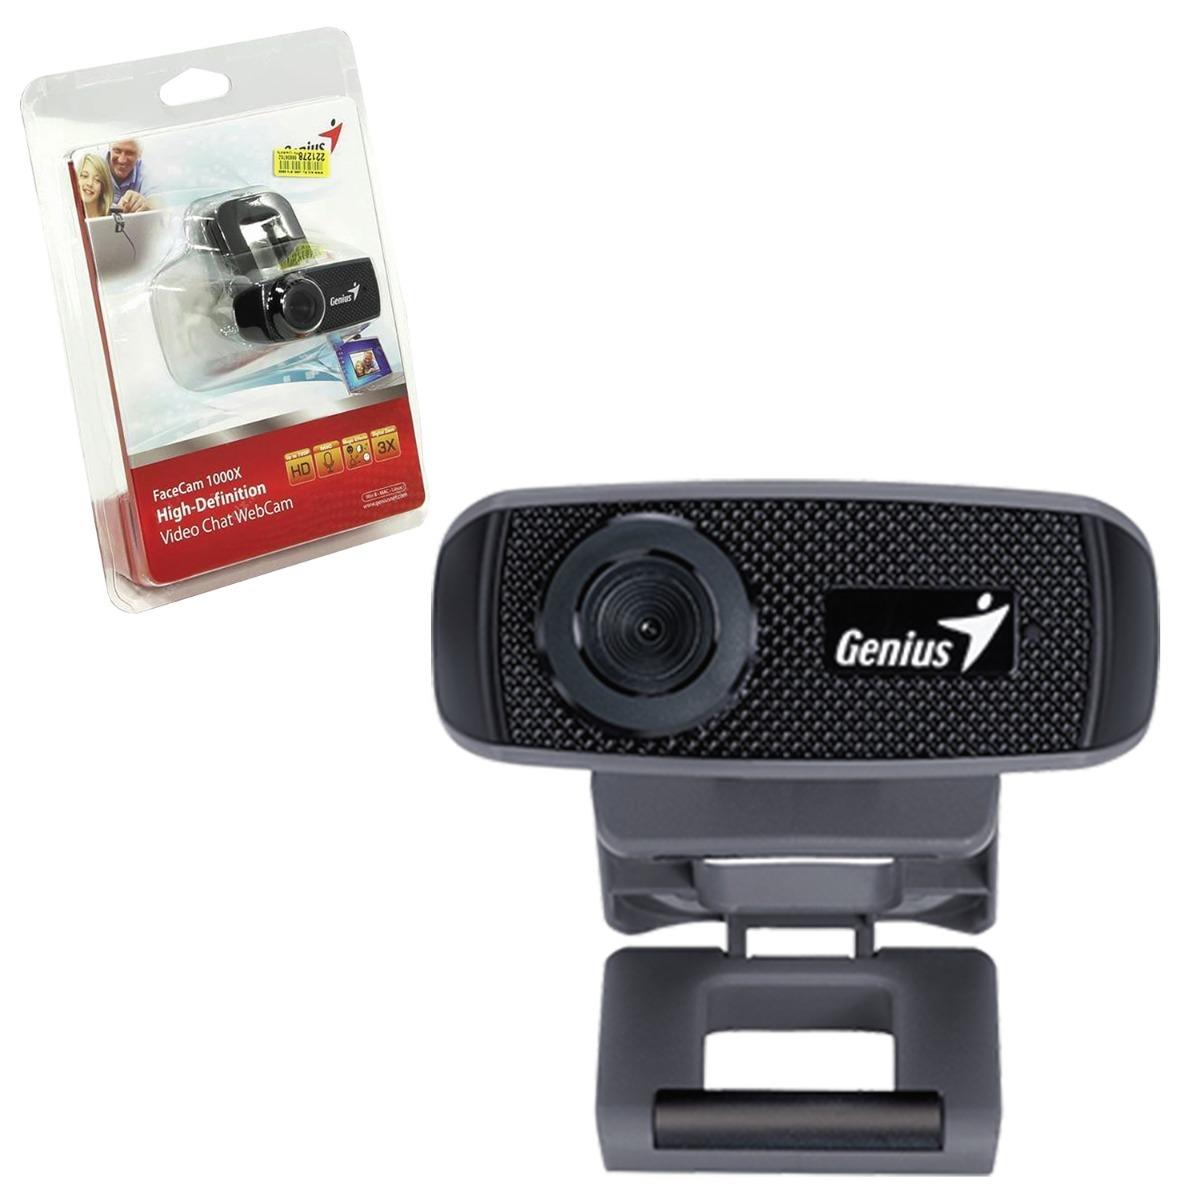 9d85acb35b9 Webcam Genius Facecam 1000x Hd 720p Usb 2.0 Zoom 3x - R$ 149,92 em ...